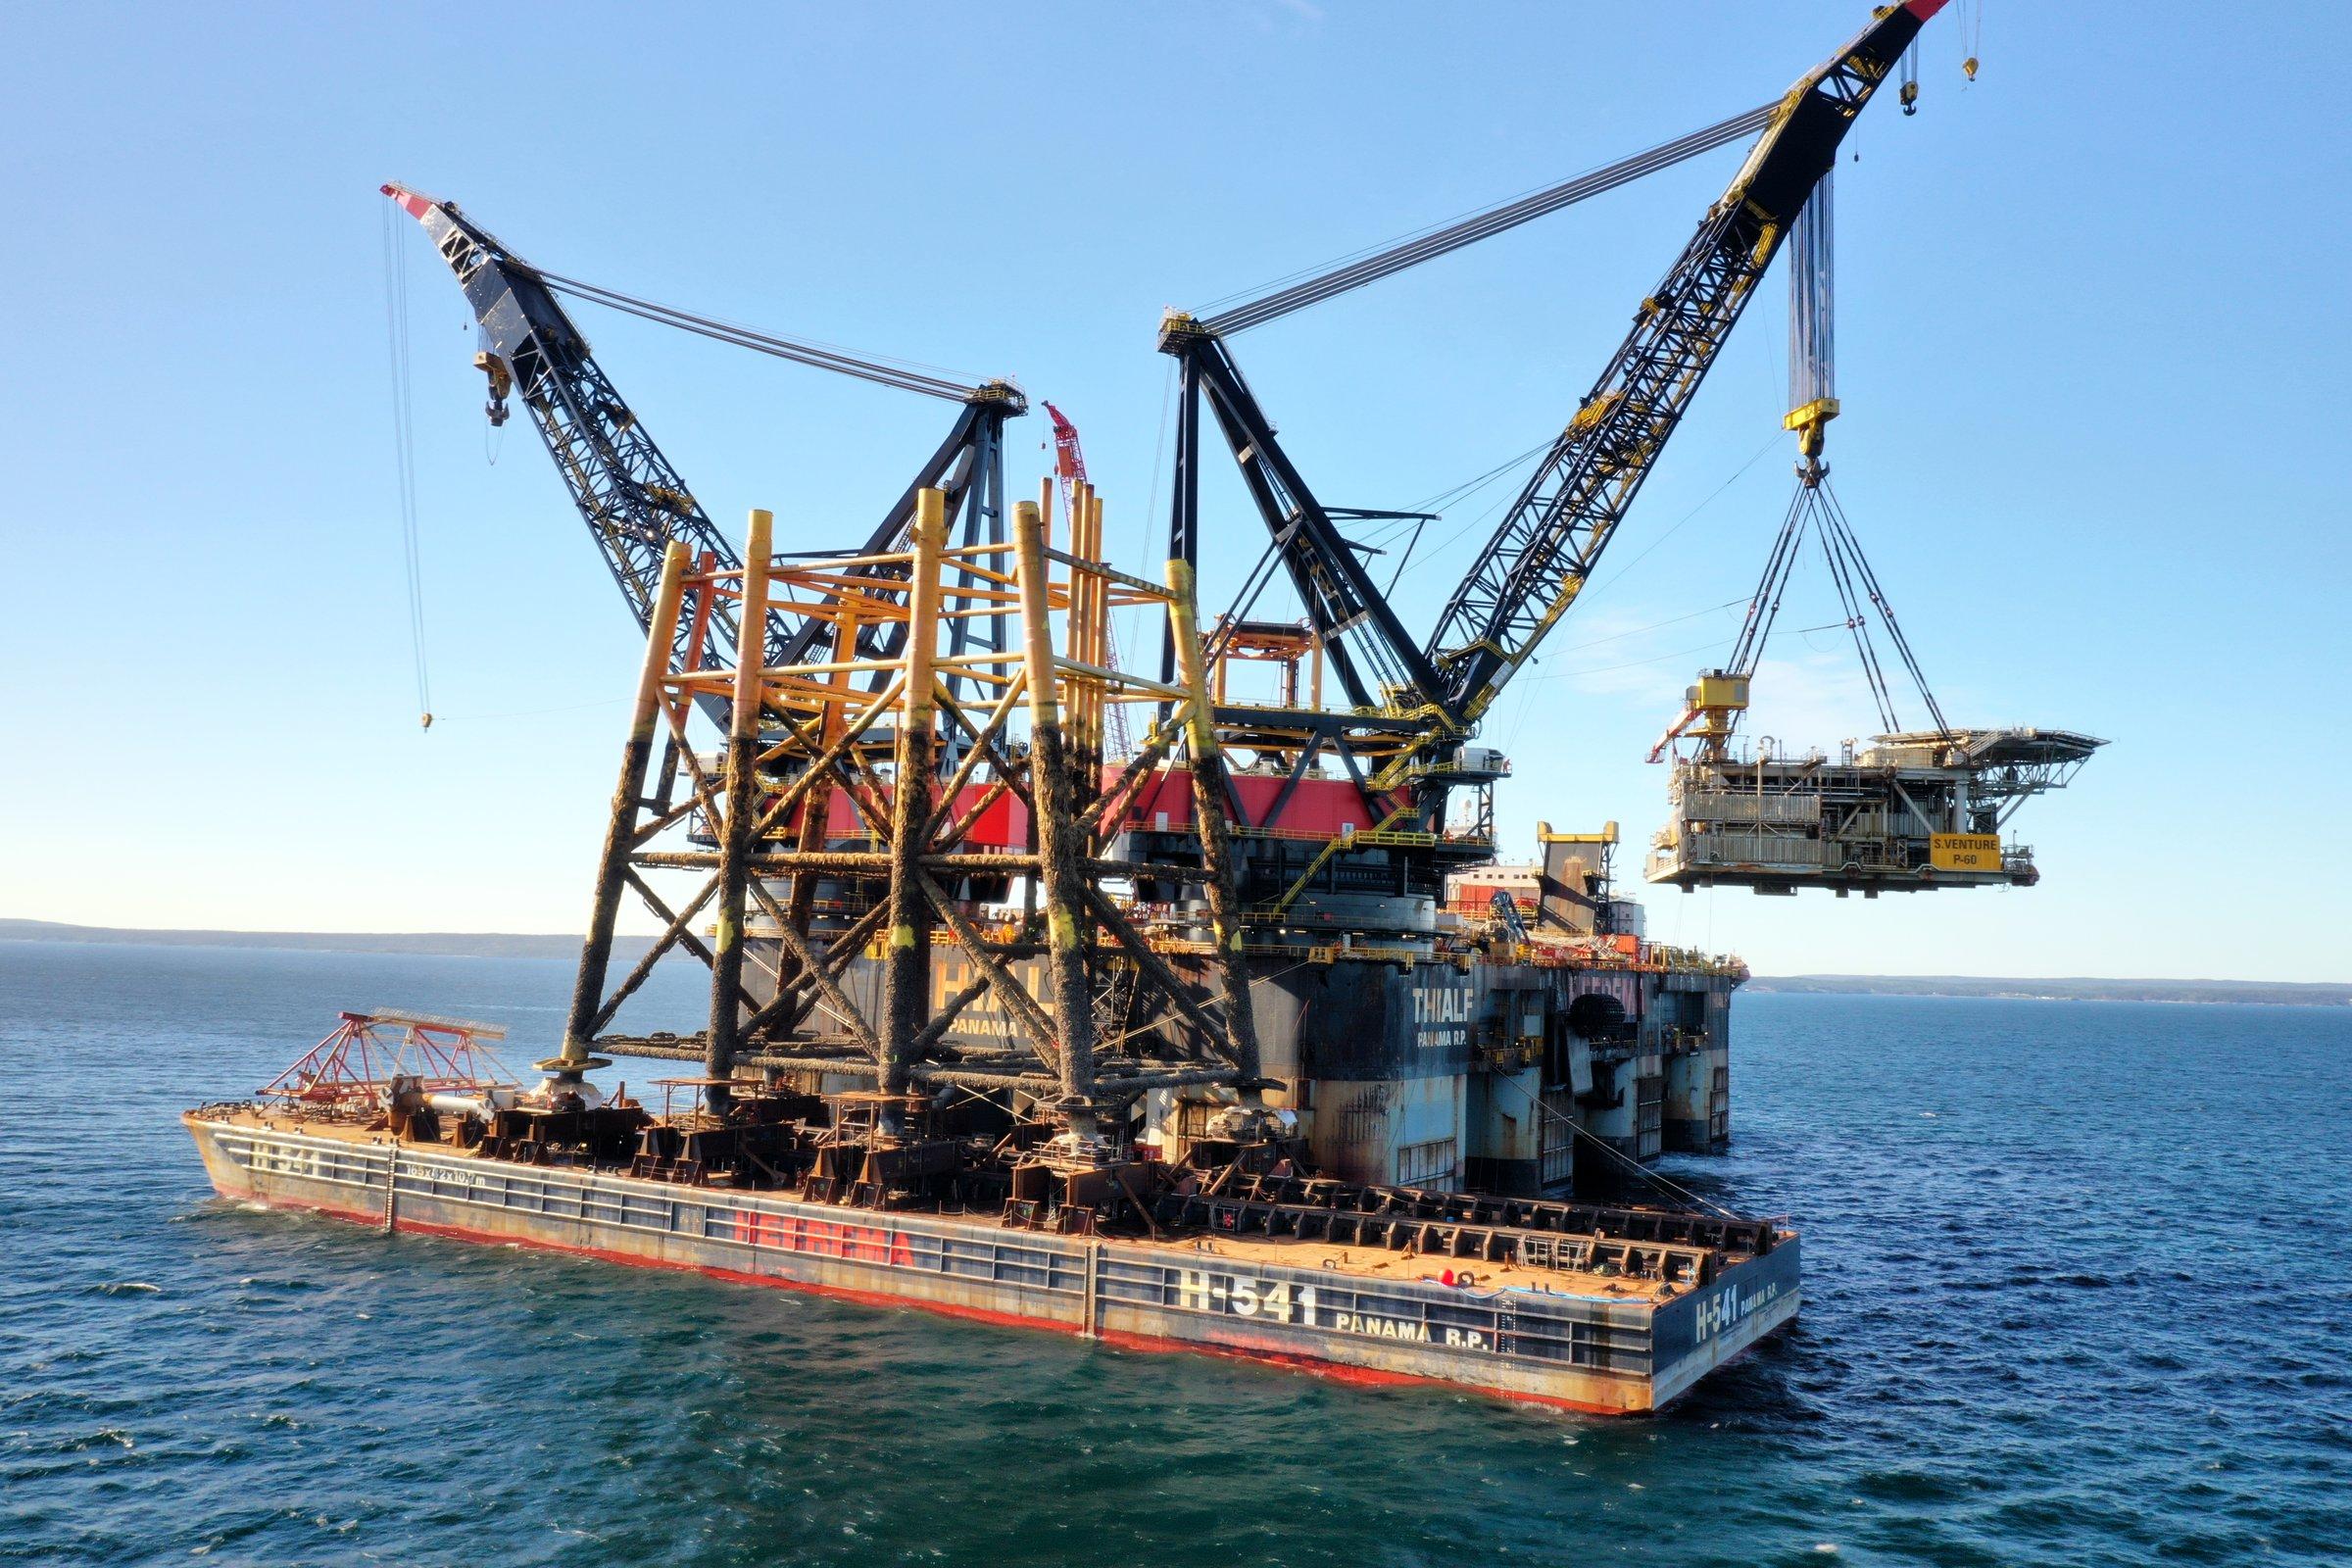 Sable Island Exxonmobil Heerema Thialf removal recycling decommissioning